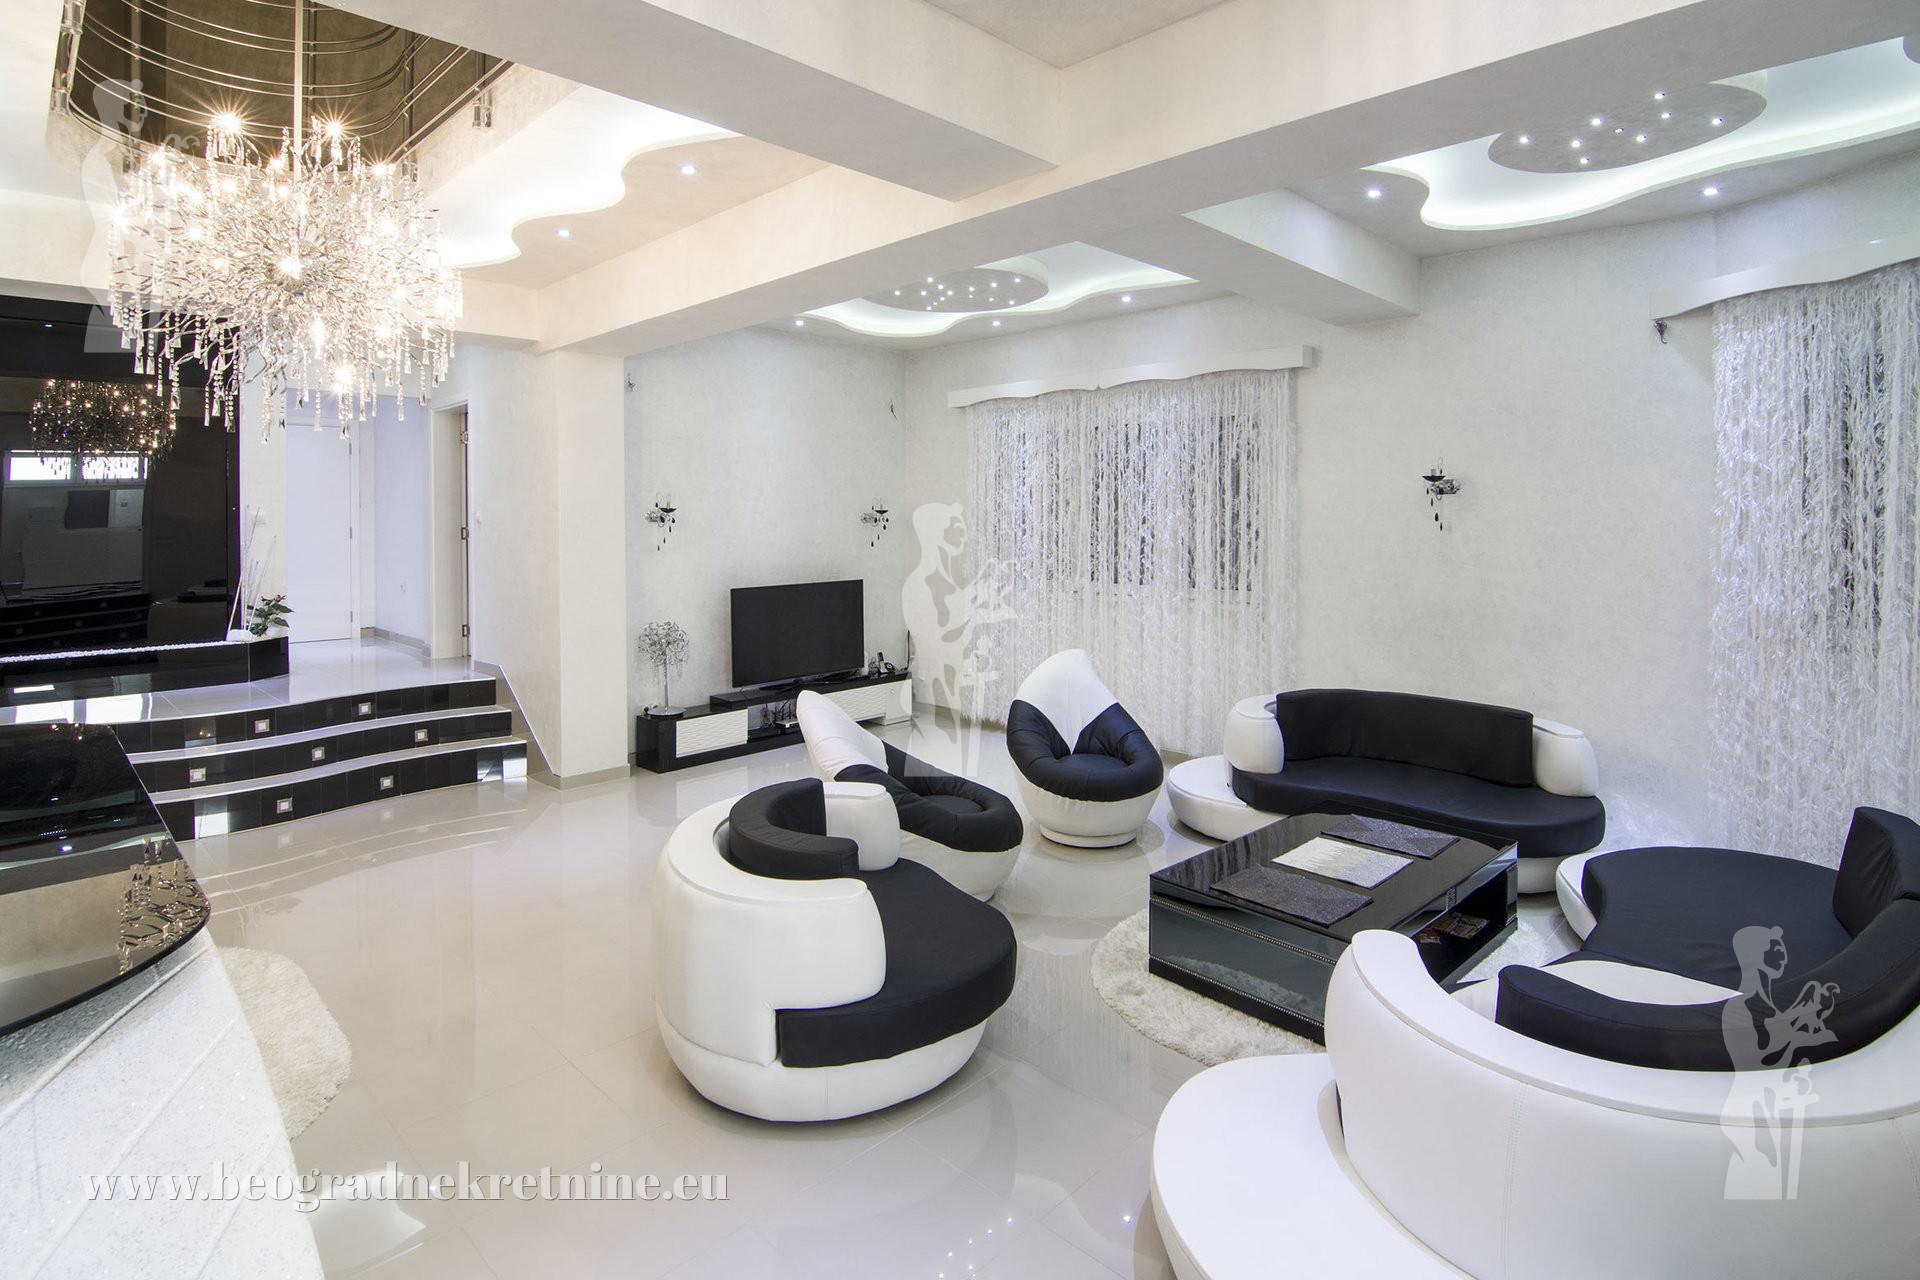 Crno bela luksuzna 7 0 kuća Gornji grad Zemun